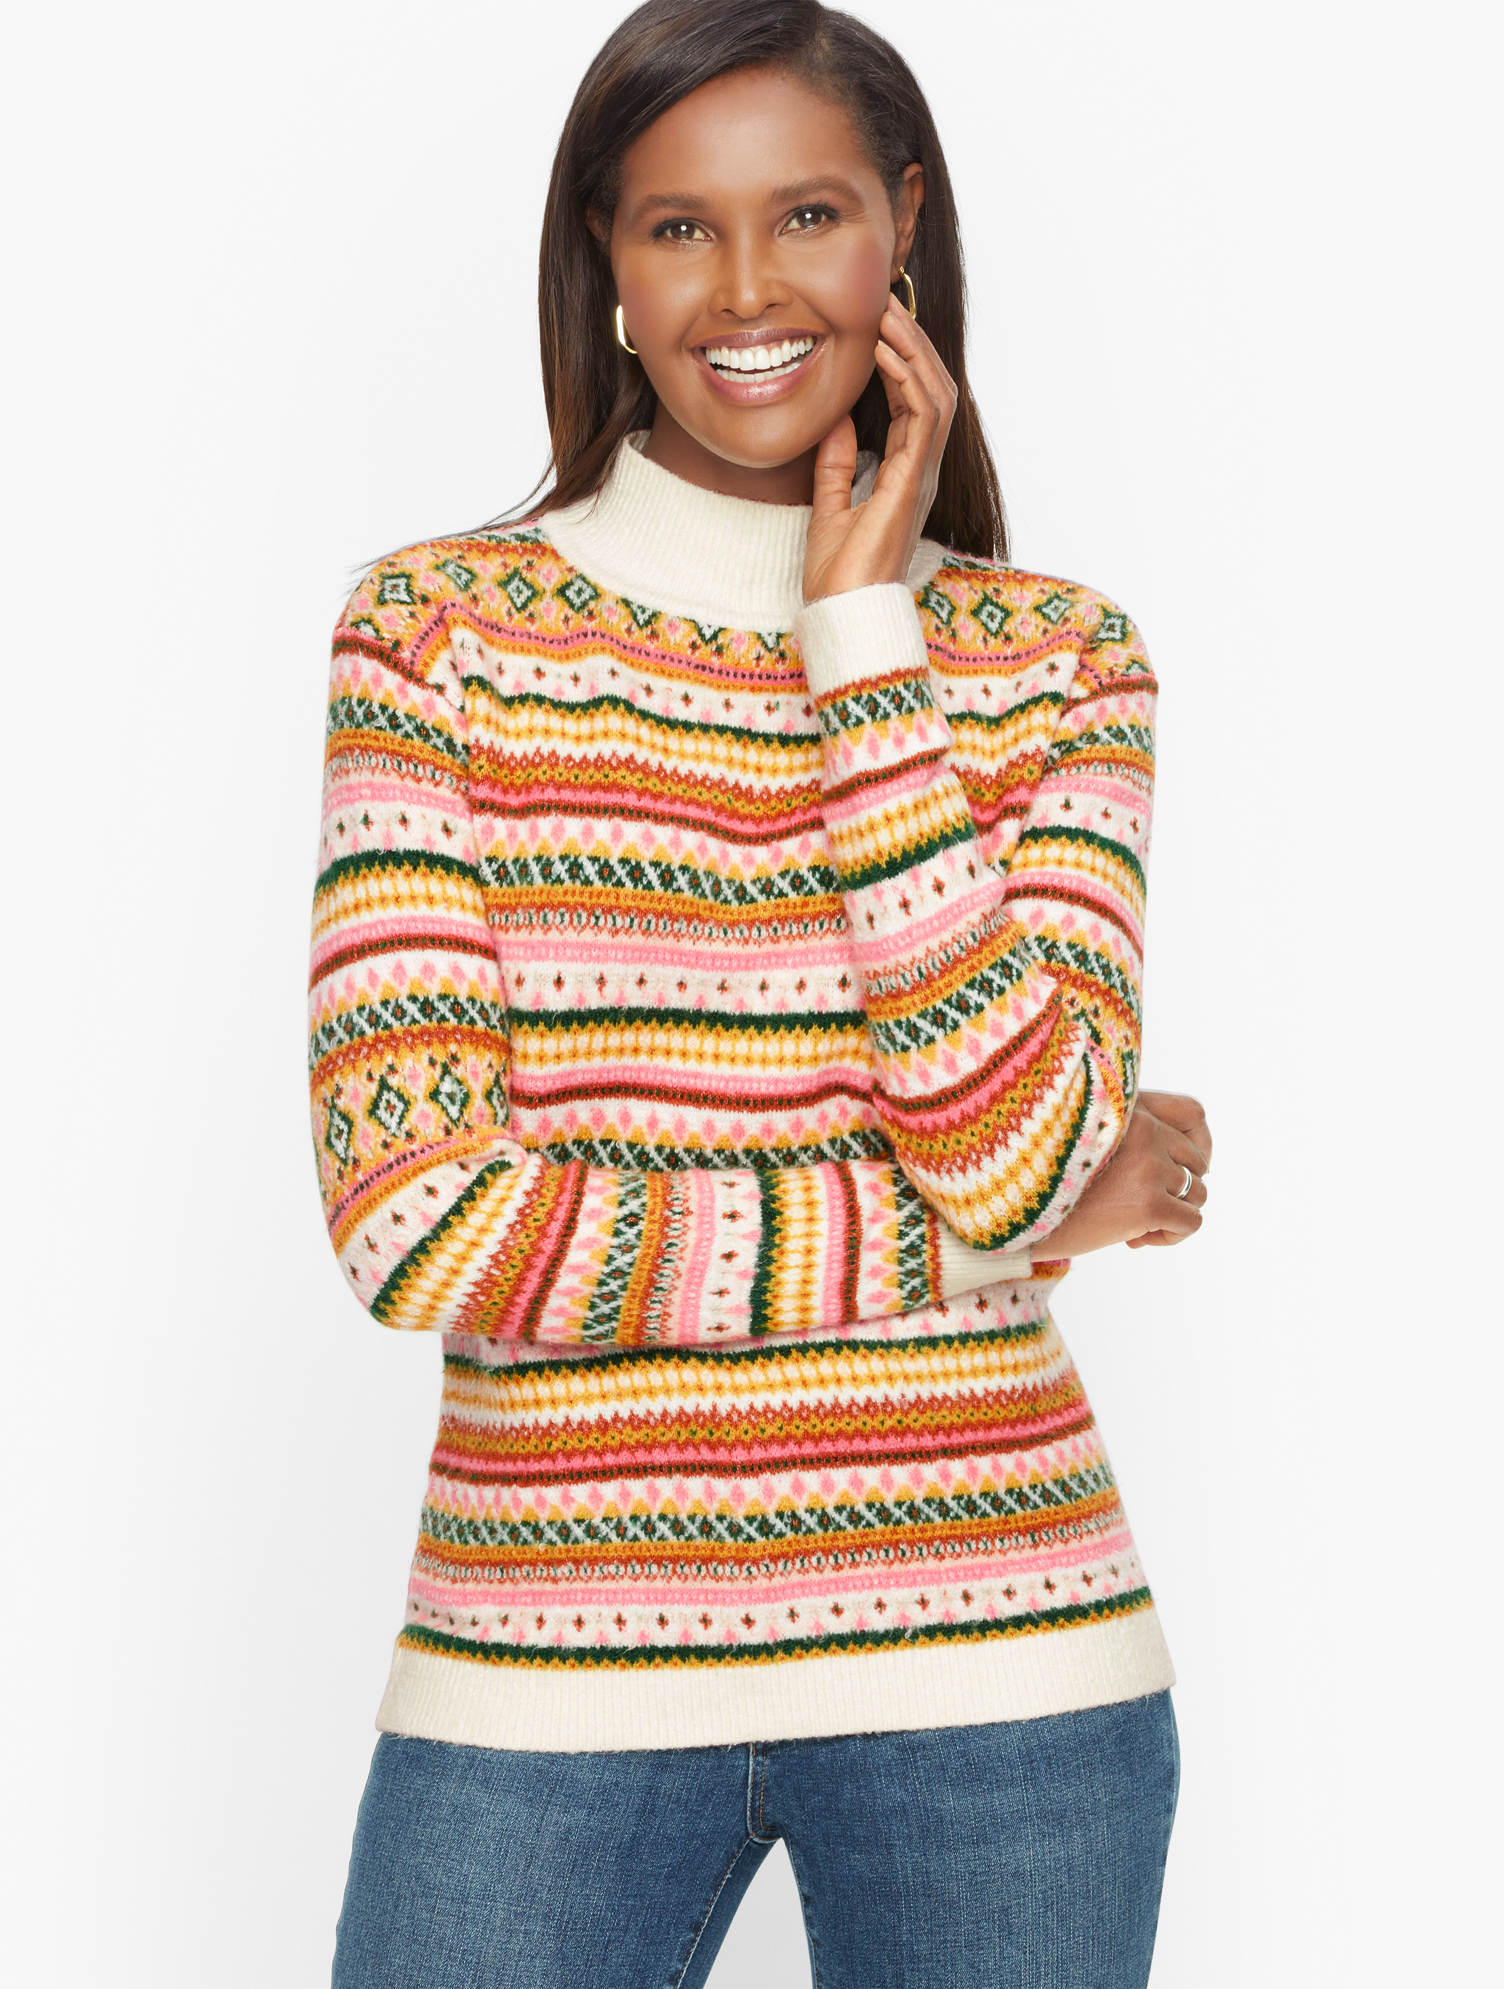 1960s Style Clothing & 60s Fashion Petite - Fair Isle Mockneck Pullover Sweater - Ivory - XL Talbots $99.00 AT vintagedancer.com